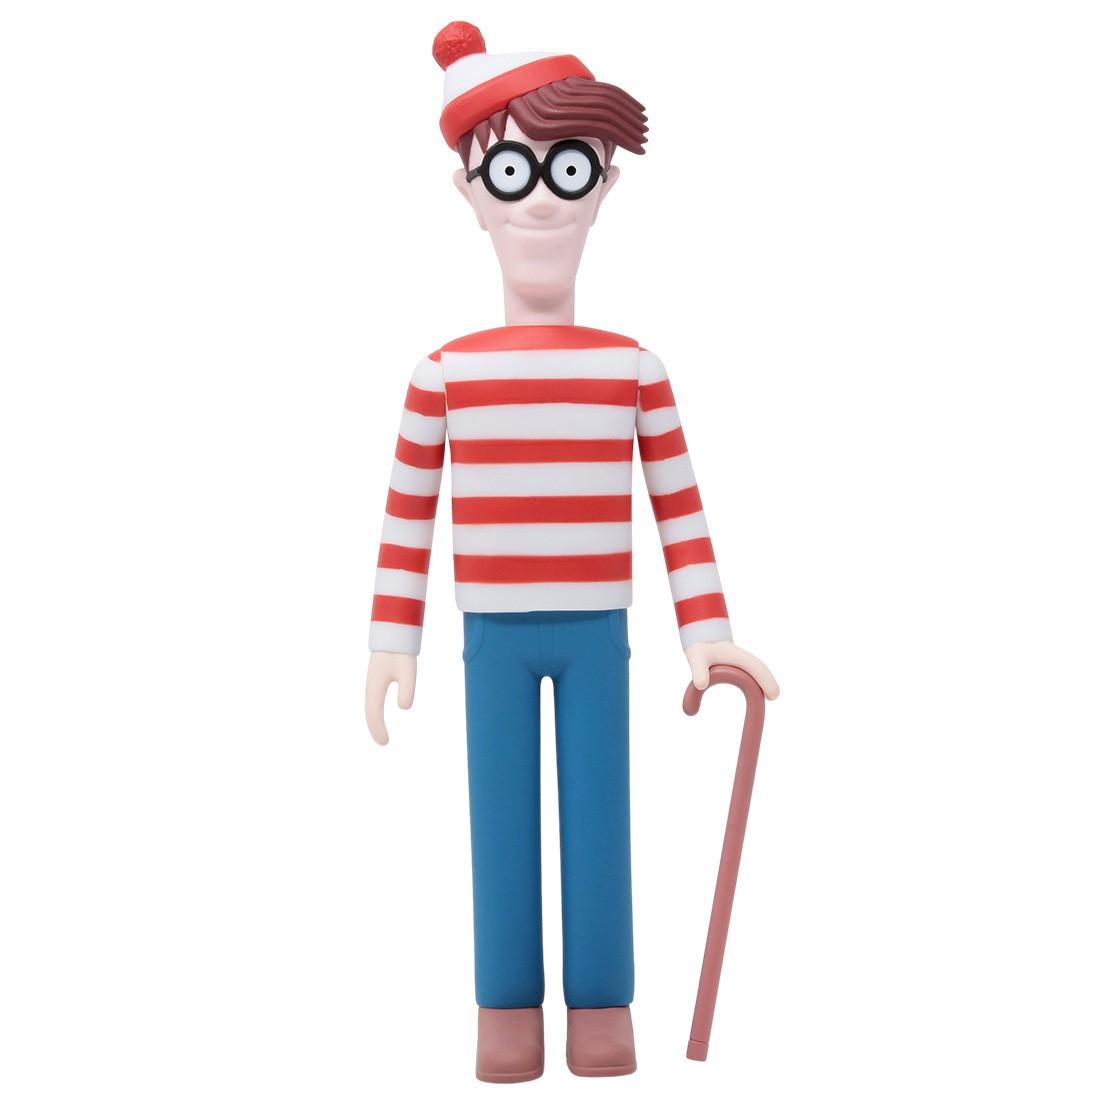 Medicom VCD Where's Wally? Wally Figure (red)